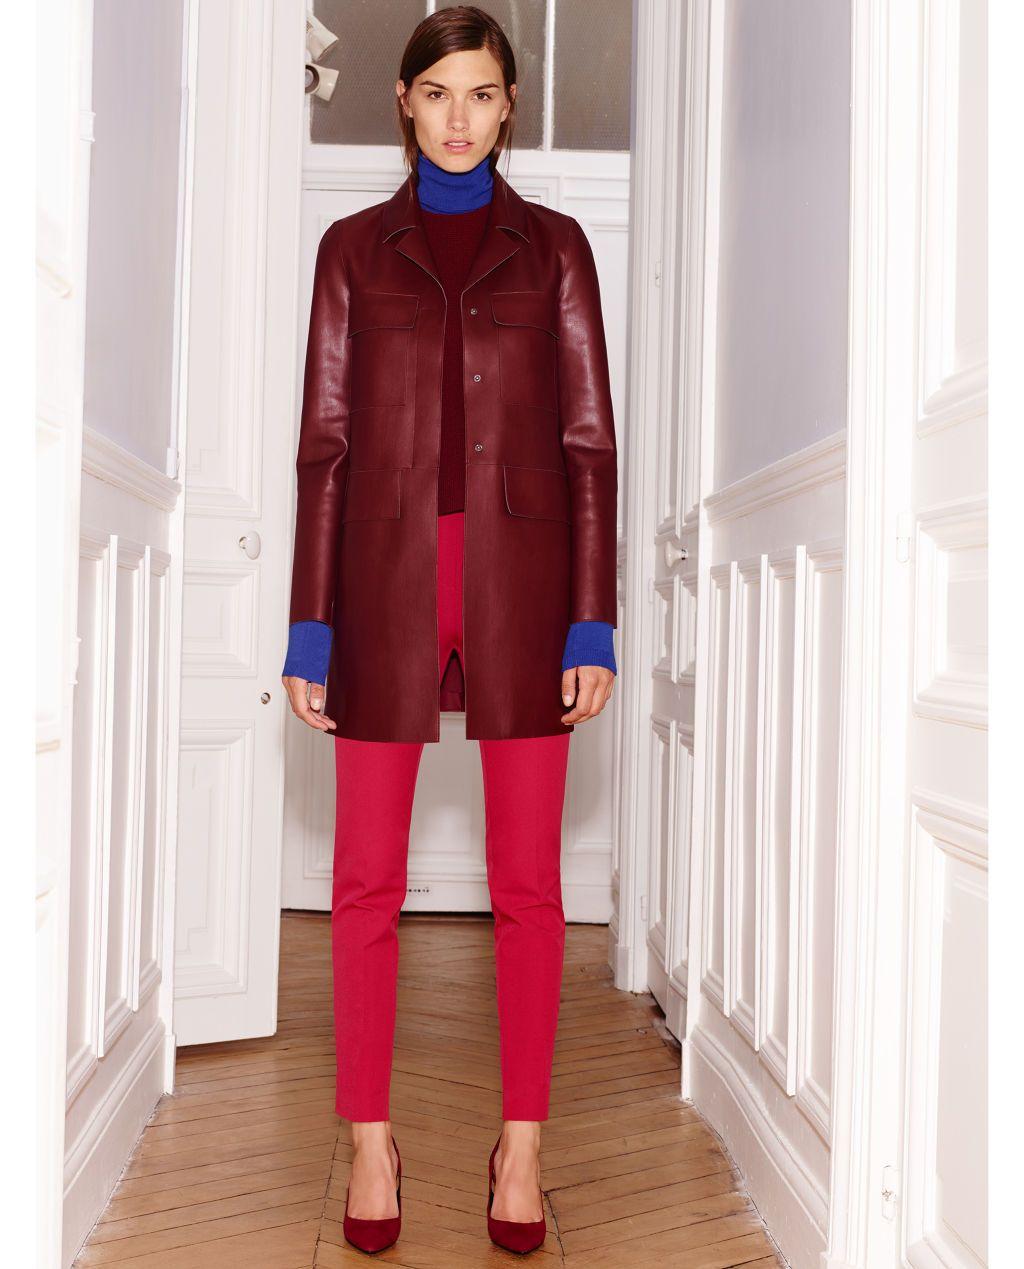 Burgundy, Poppy, and Cobalt Zara Fall fashion colors